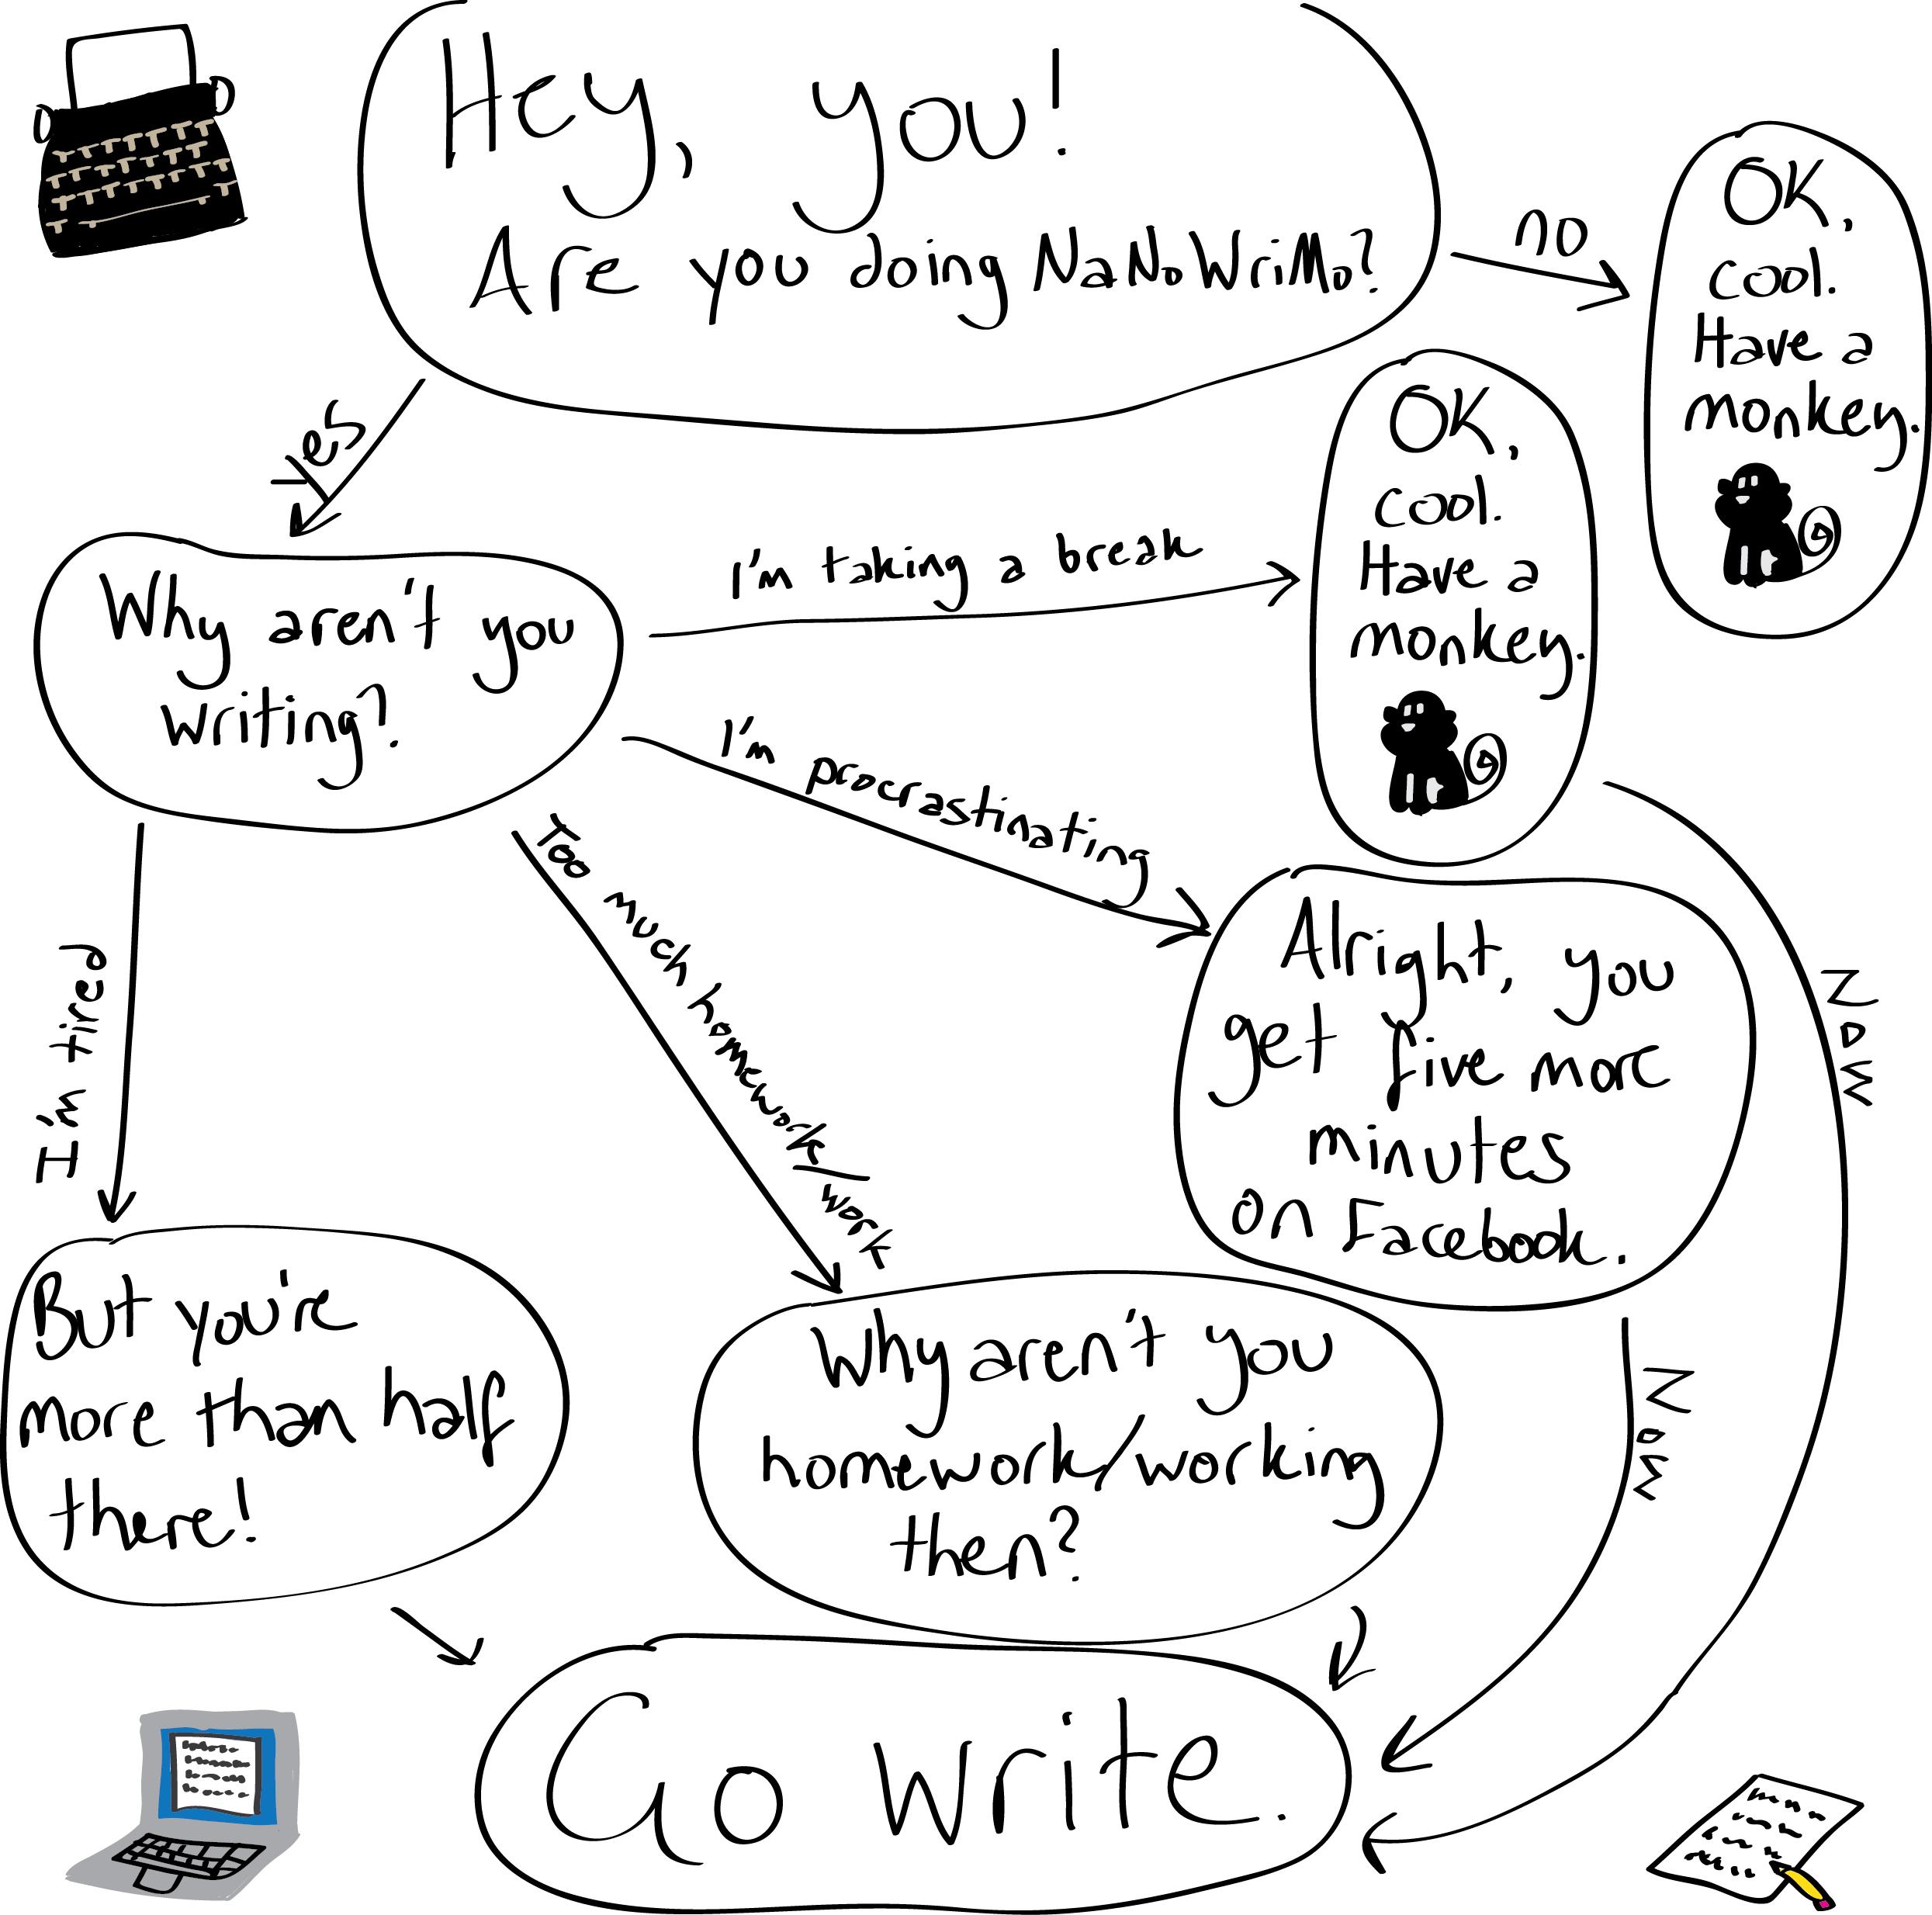 I'm having a writing problem?